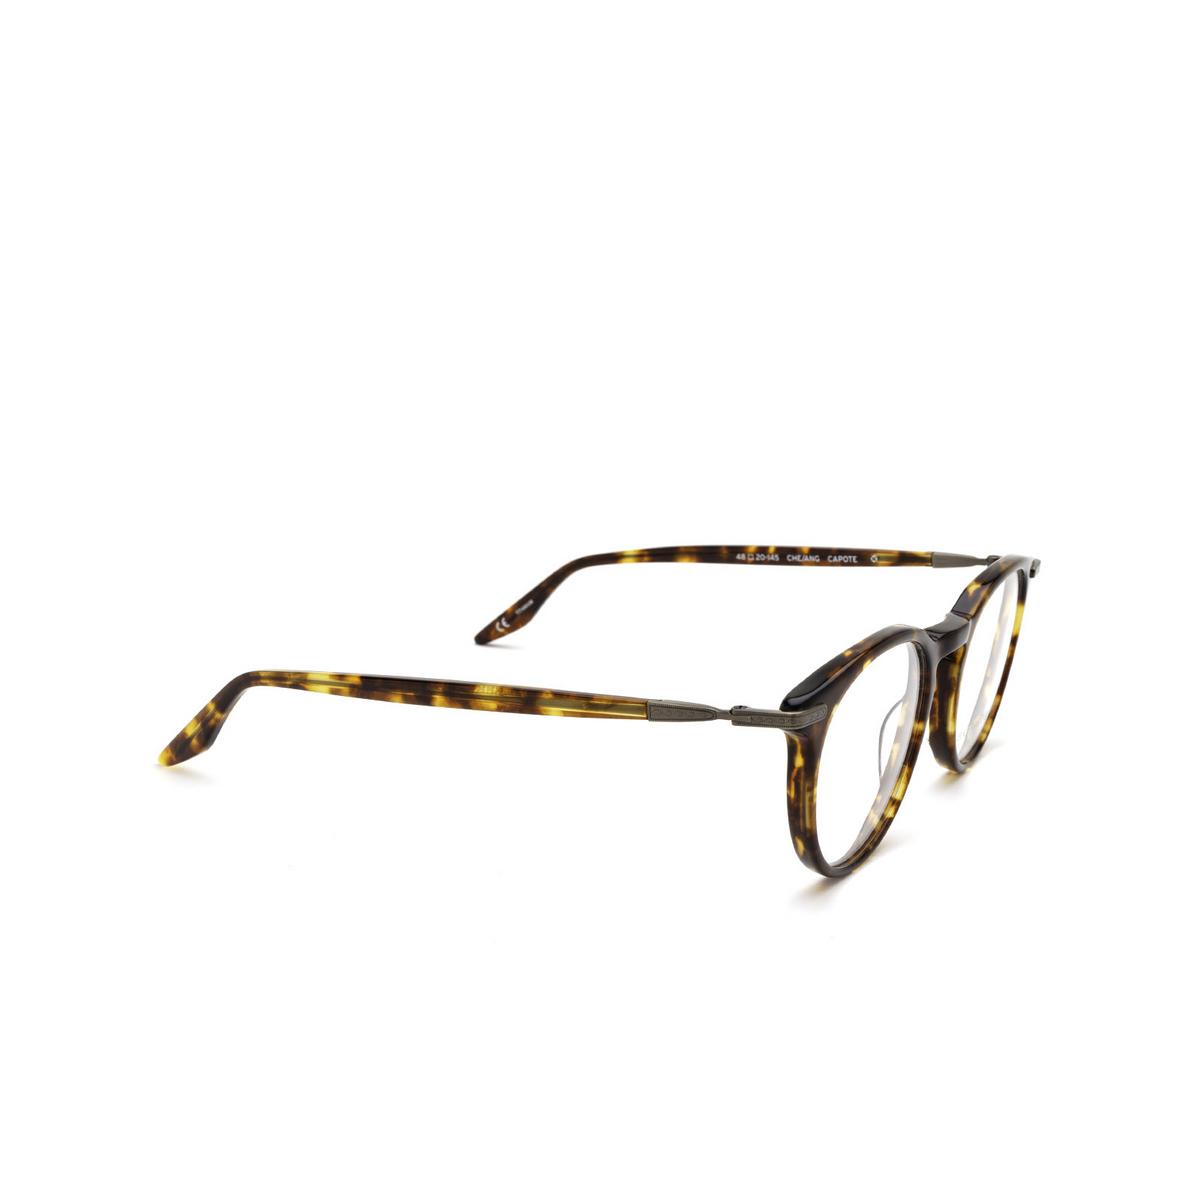 Barton Perreira® Round Eyeglasses: Capote BP5277 color Chestnut Antique Gold 0LZ - three-quarters view.